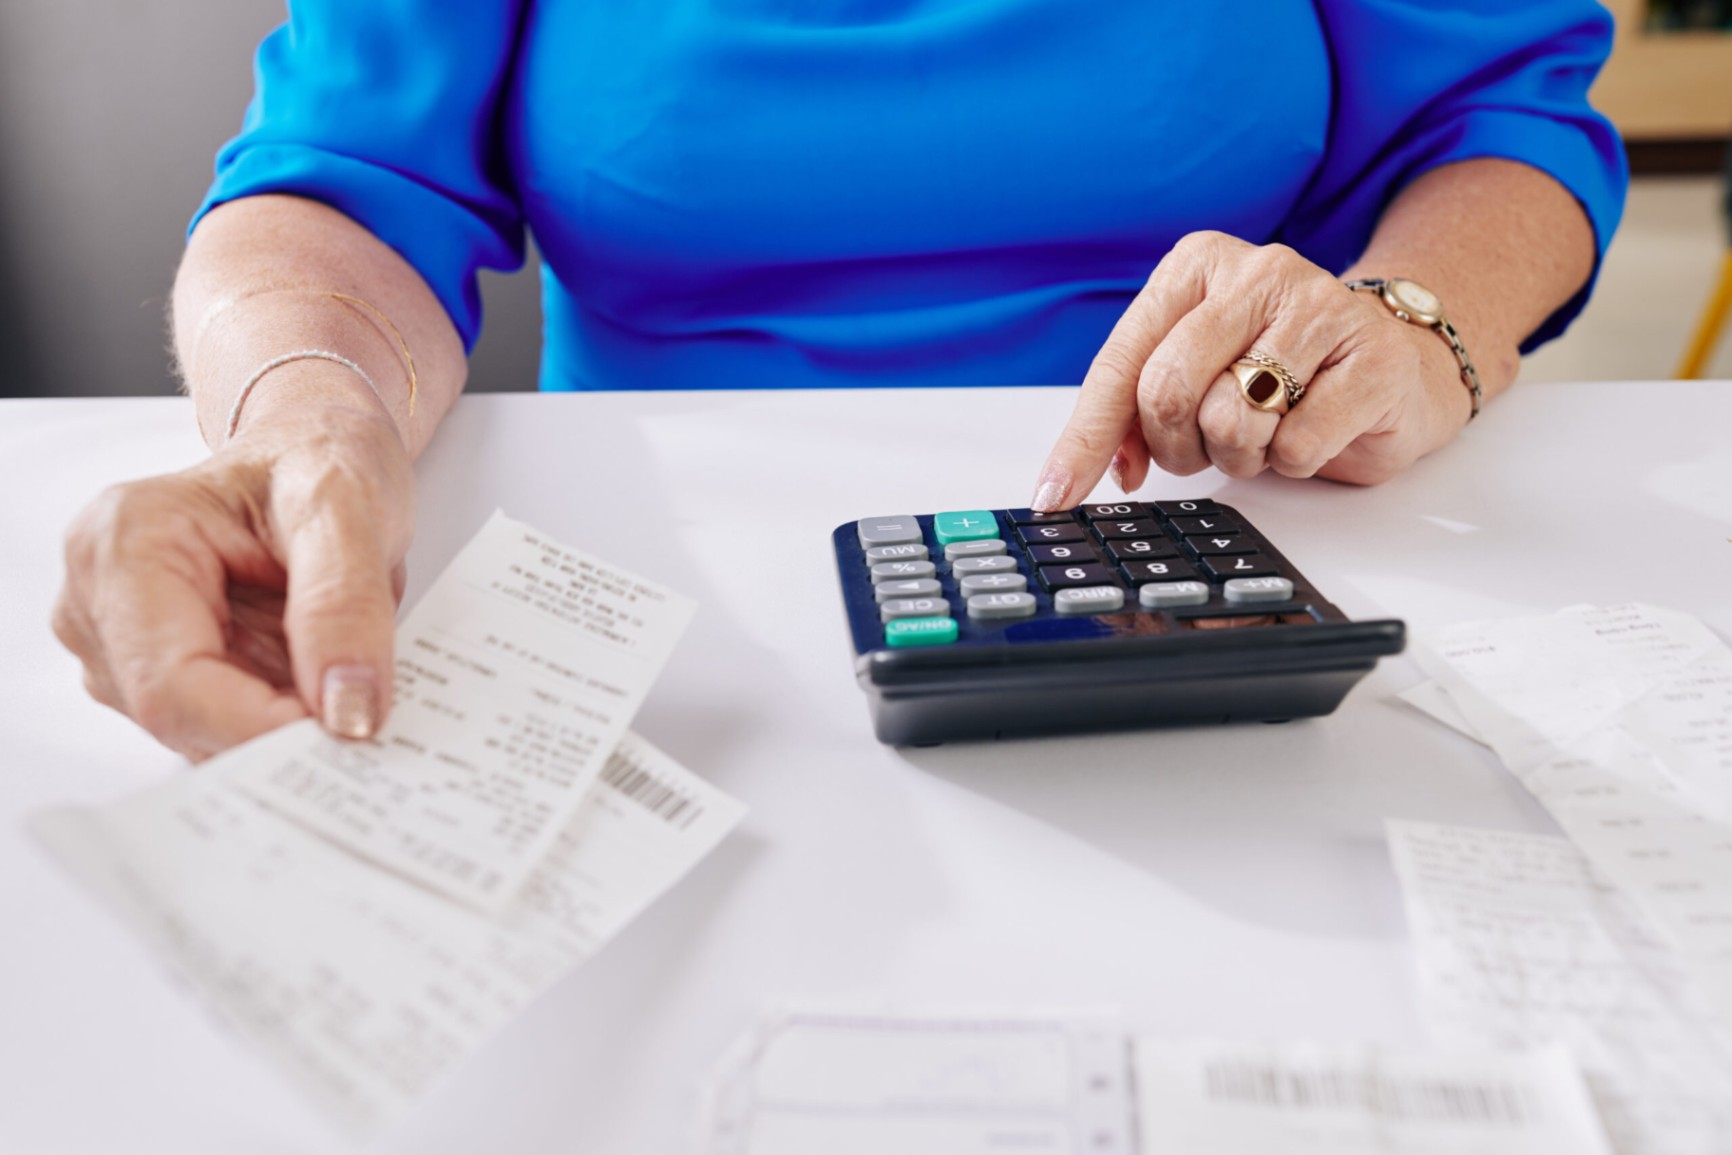 Empréstimos para aposentados – 6 cuidados para ter desde já